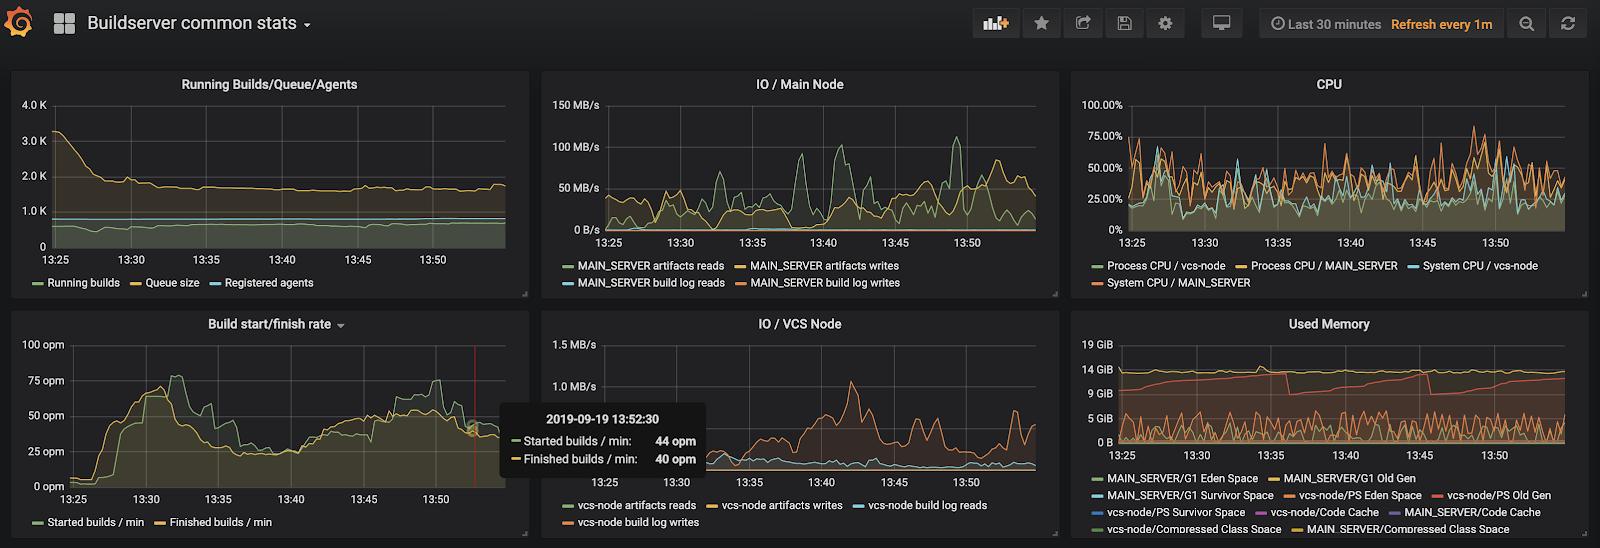 Example of TeamCity metrics represented in Grafana